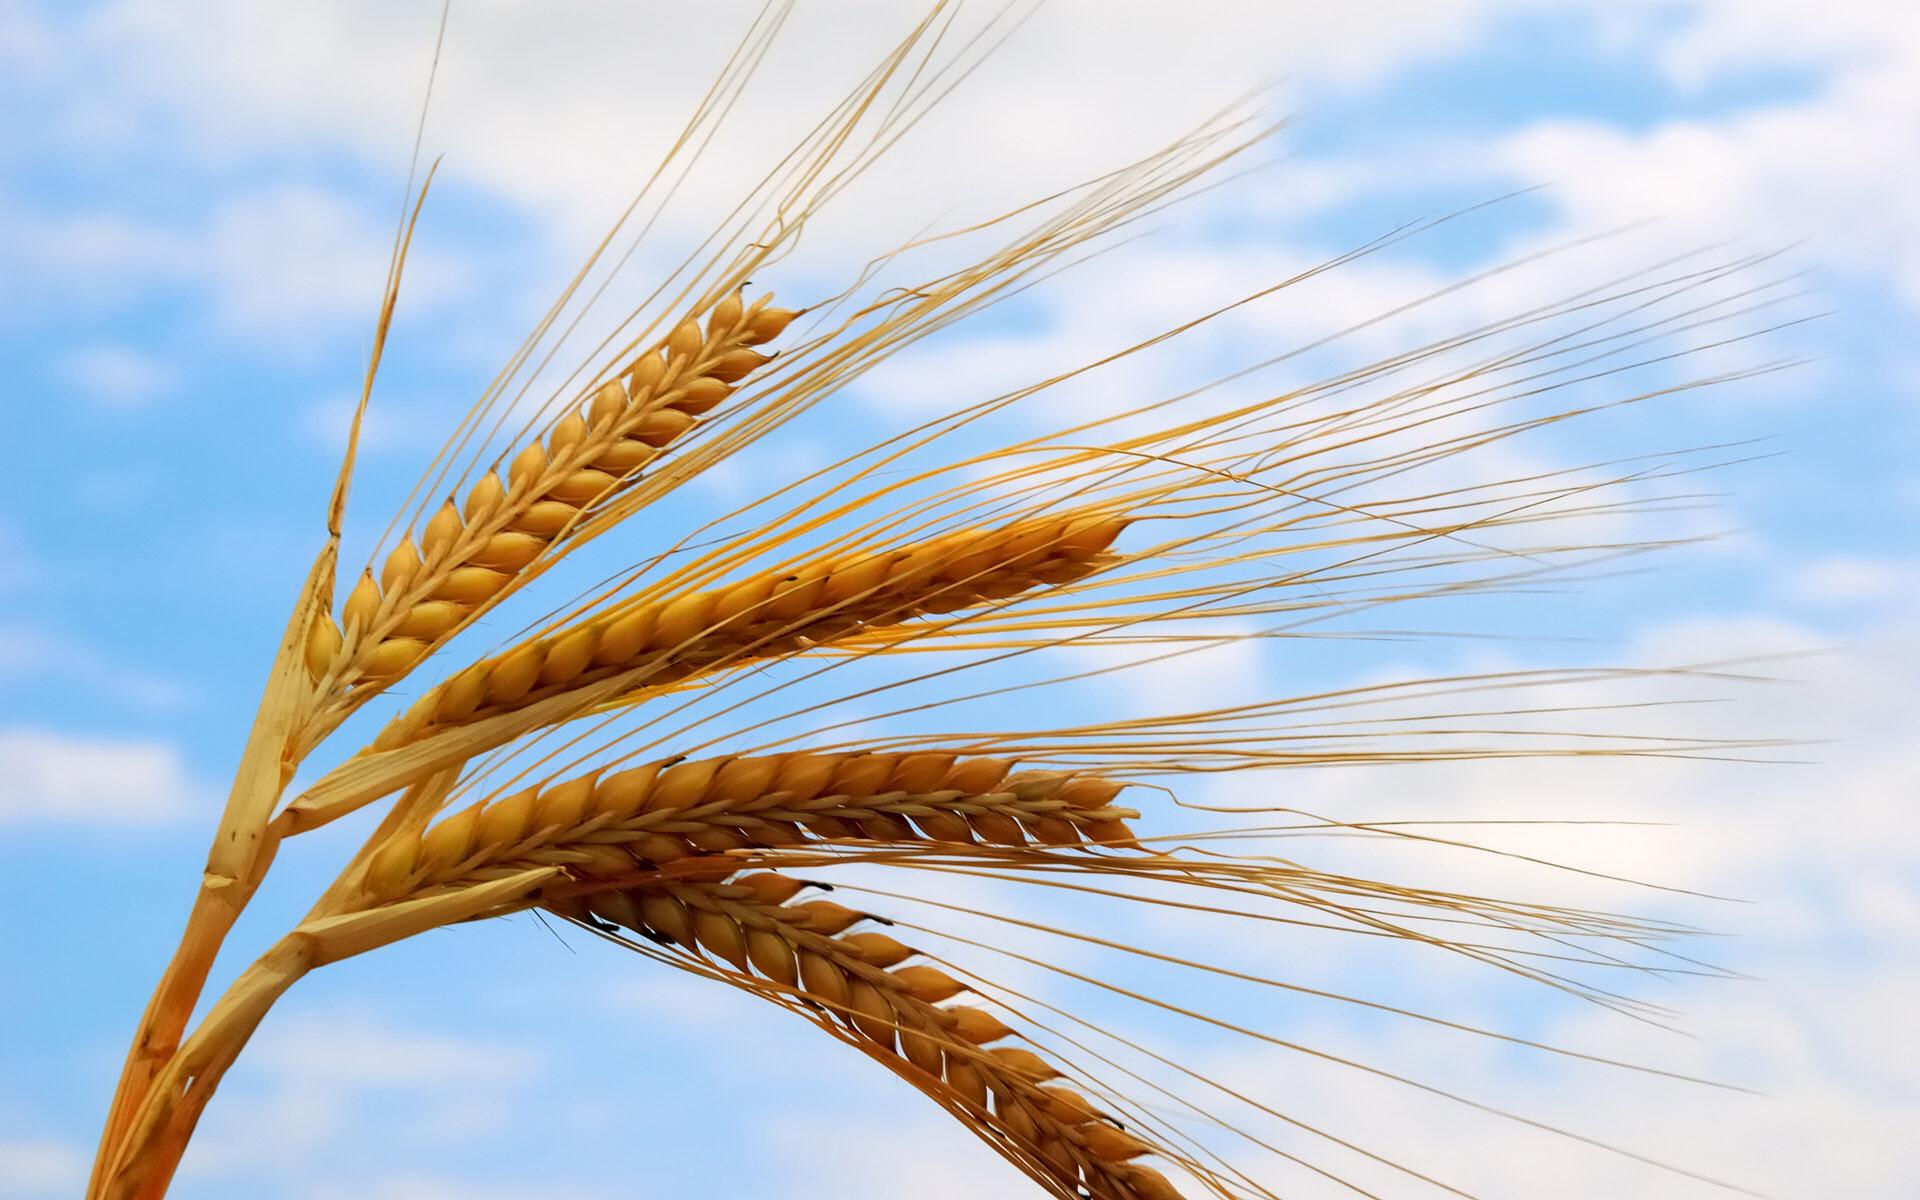 سبز  گندم در خاک » تاريخ كاشت گندم كهگيلويهبانک اطلاعاتی کشاورزی گلستان موج